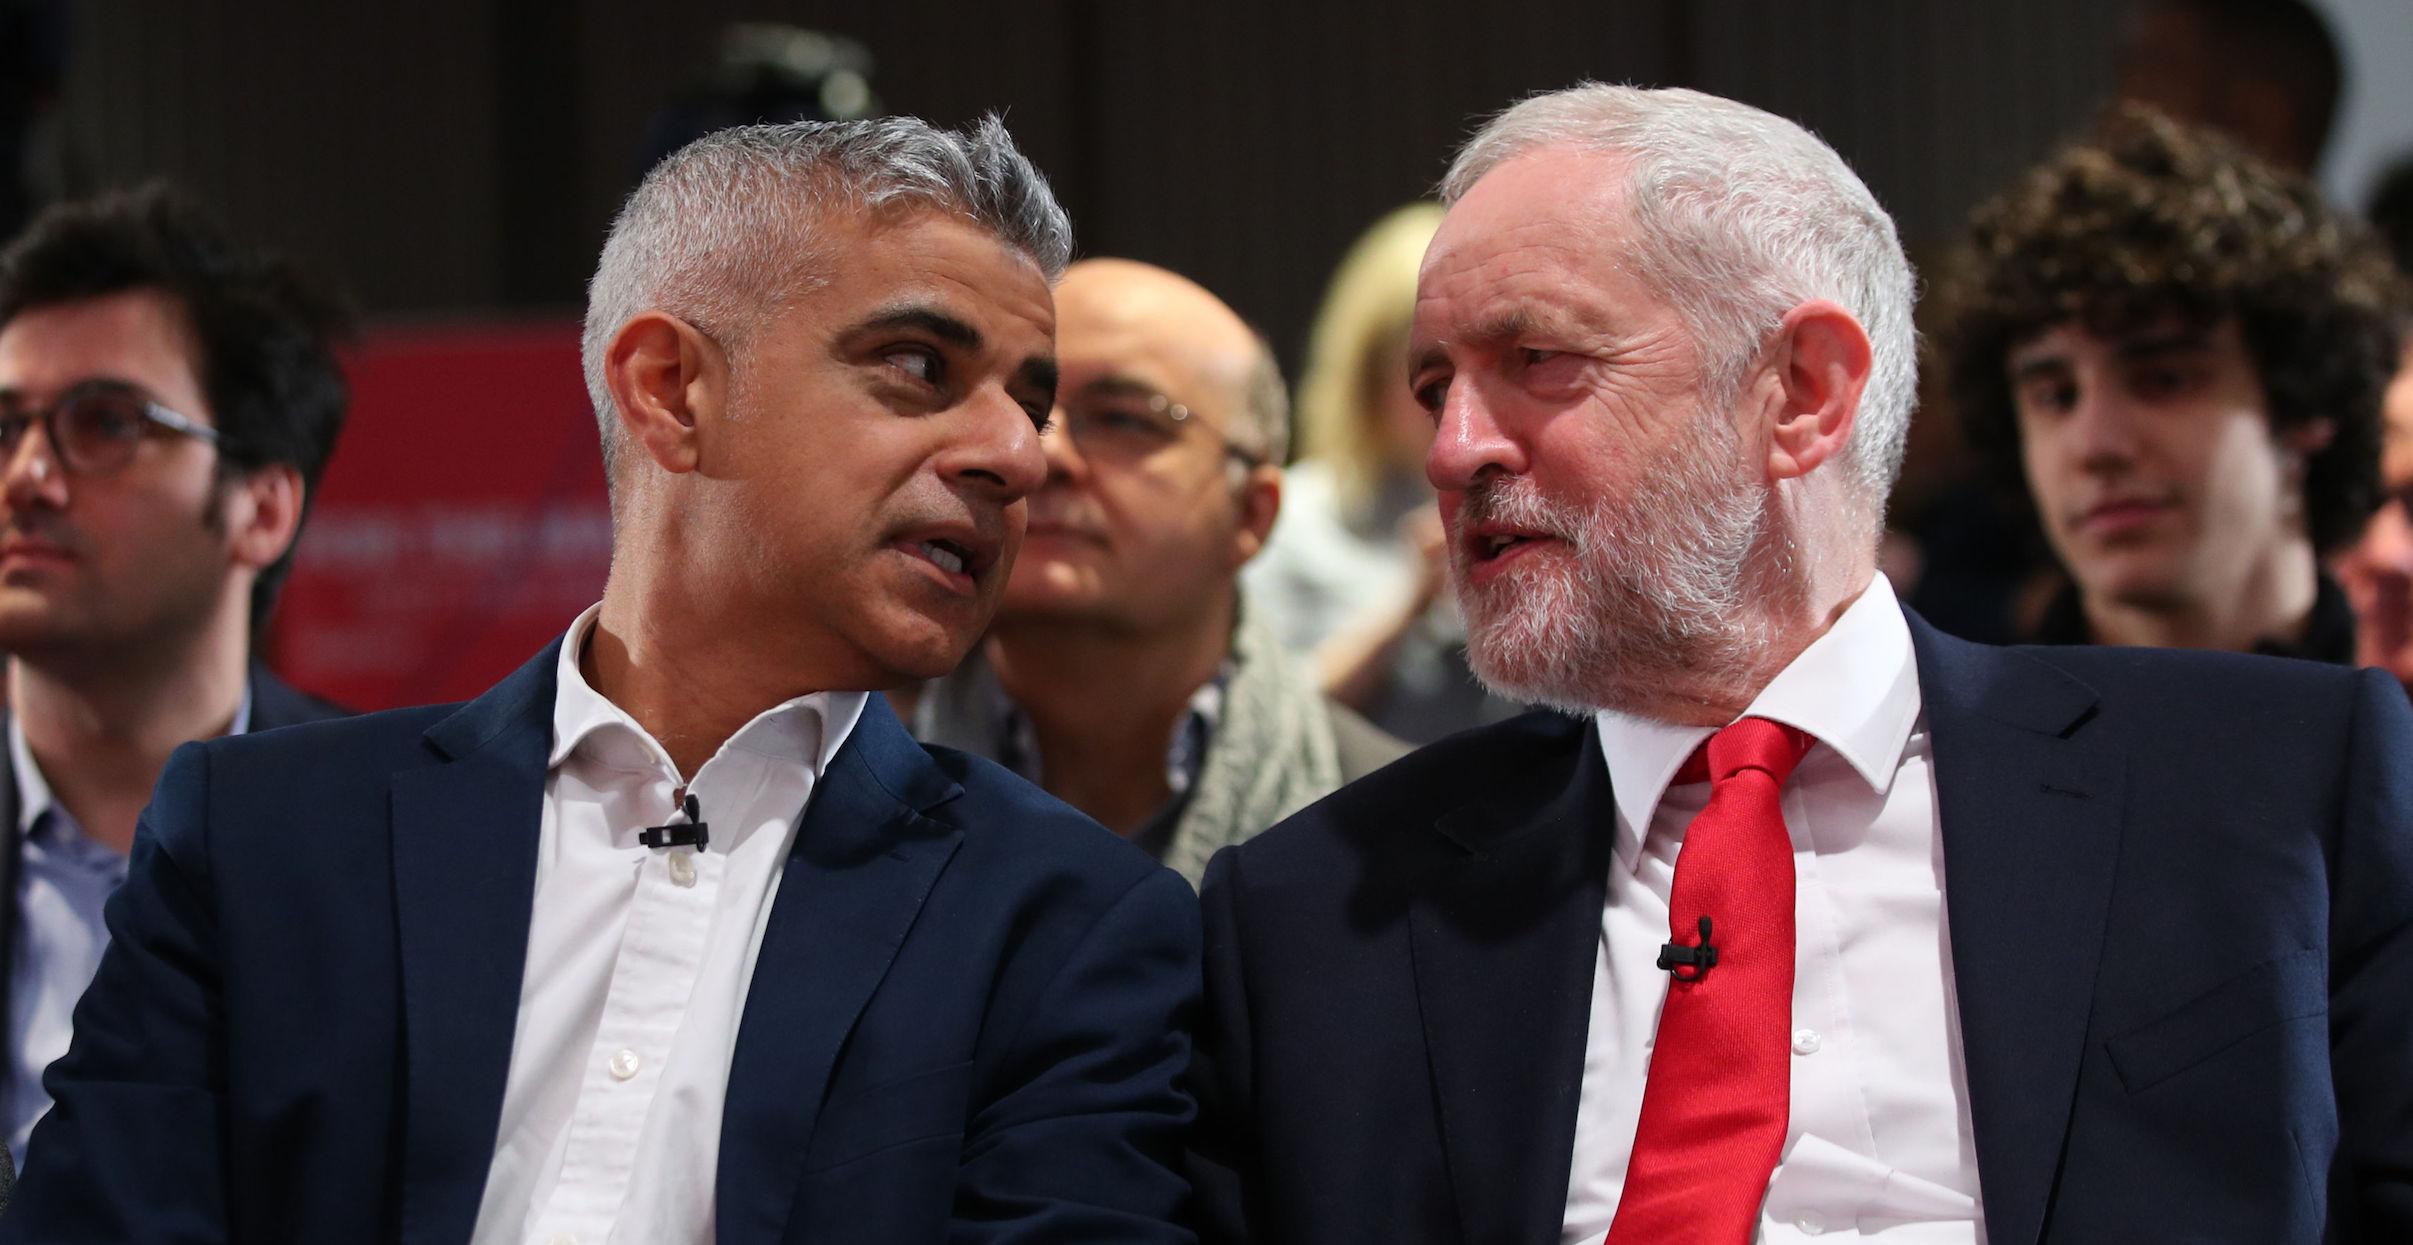 London mayor Sadiq Khan with Labour leader Jeremy Corbyn